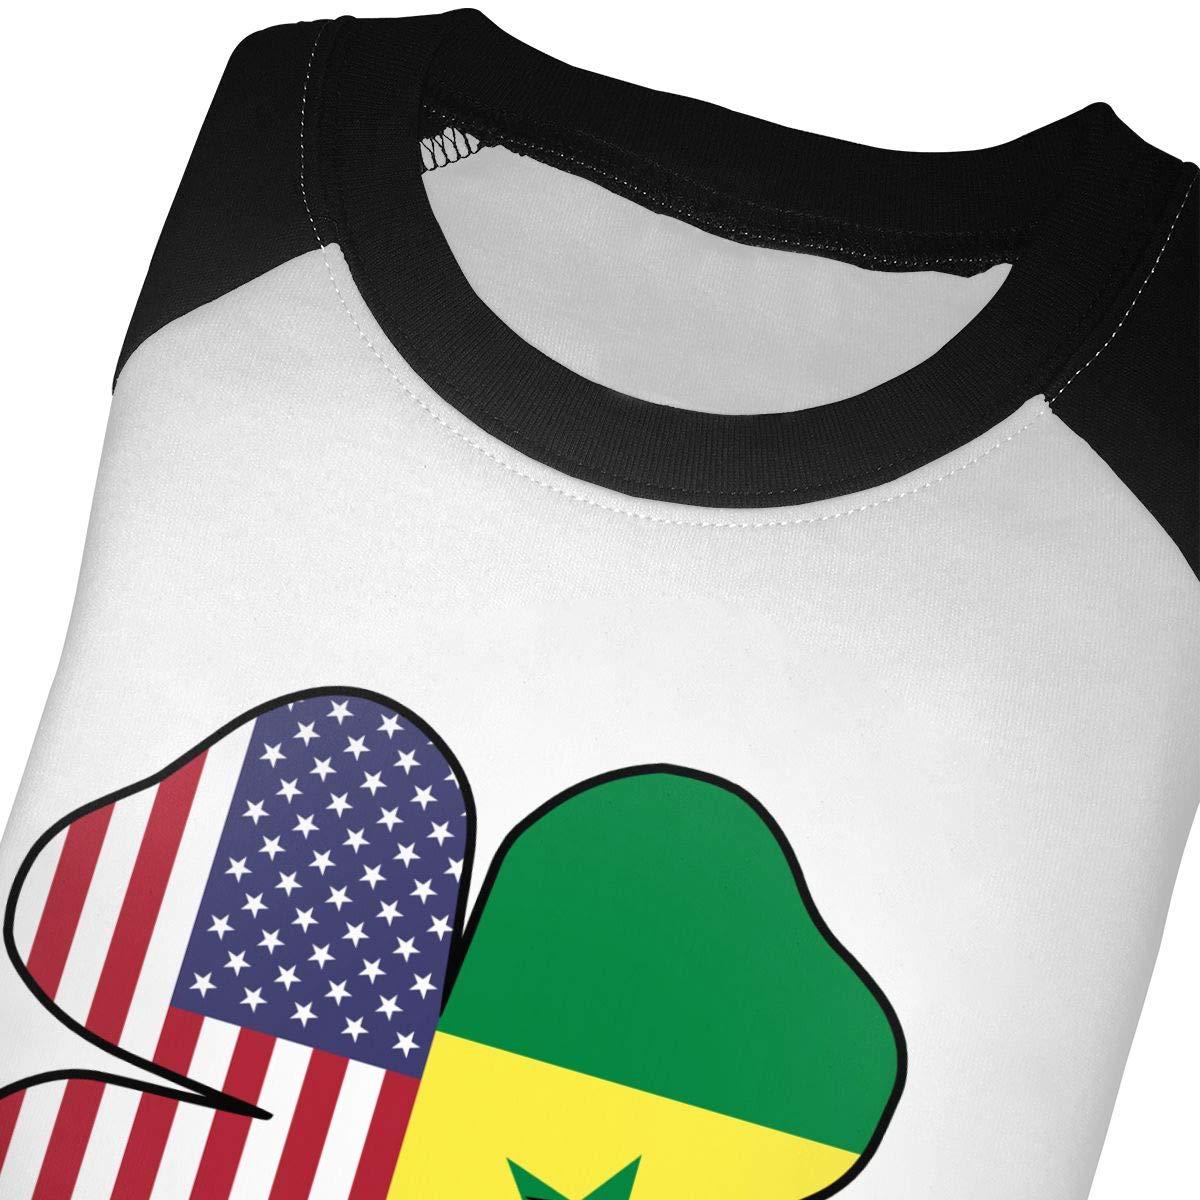 QPKMRTZTX0 Boys Girls Kids /& Toddler American Senegal Flag Shamrock Long Sleeve T-Shirt 100/% Cotton